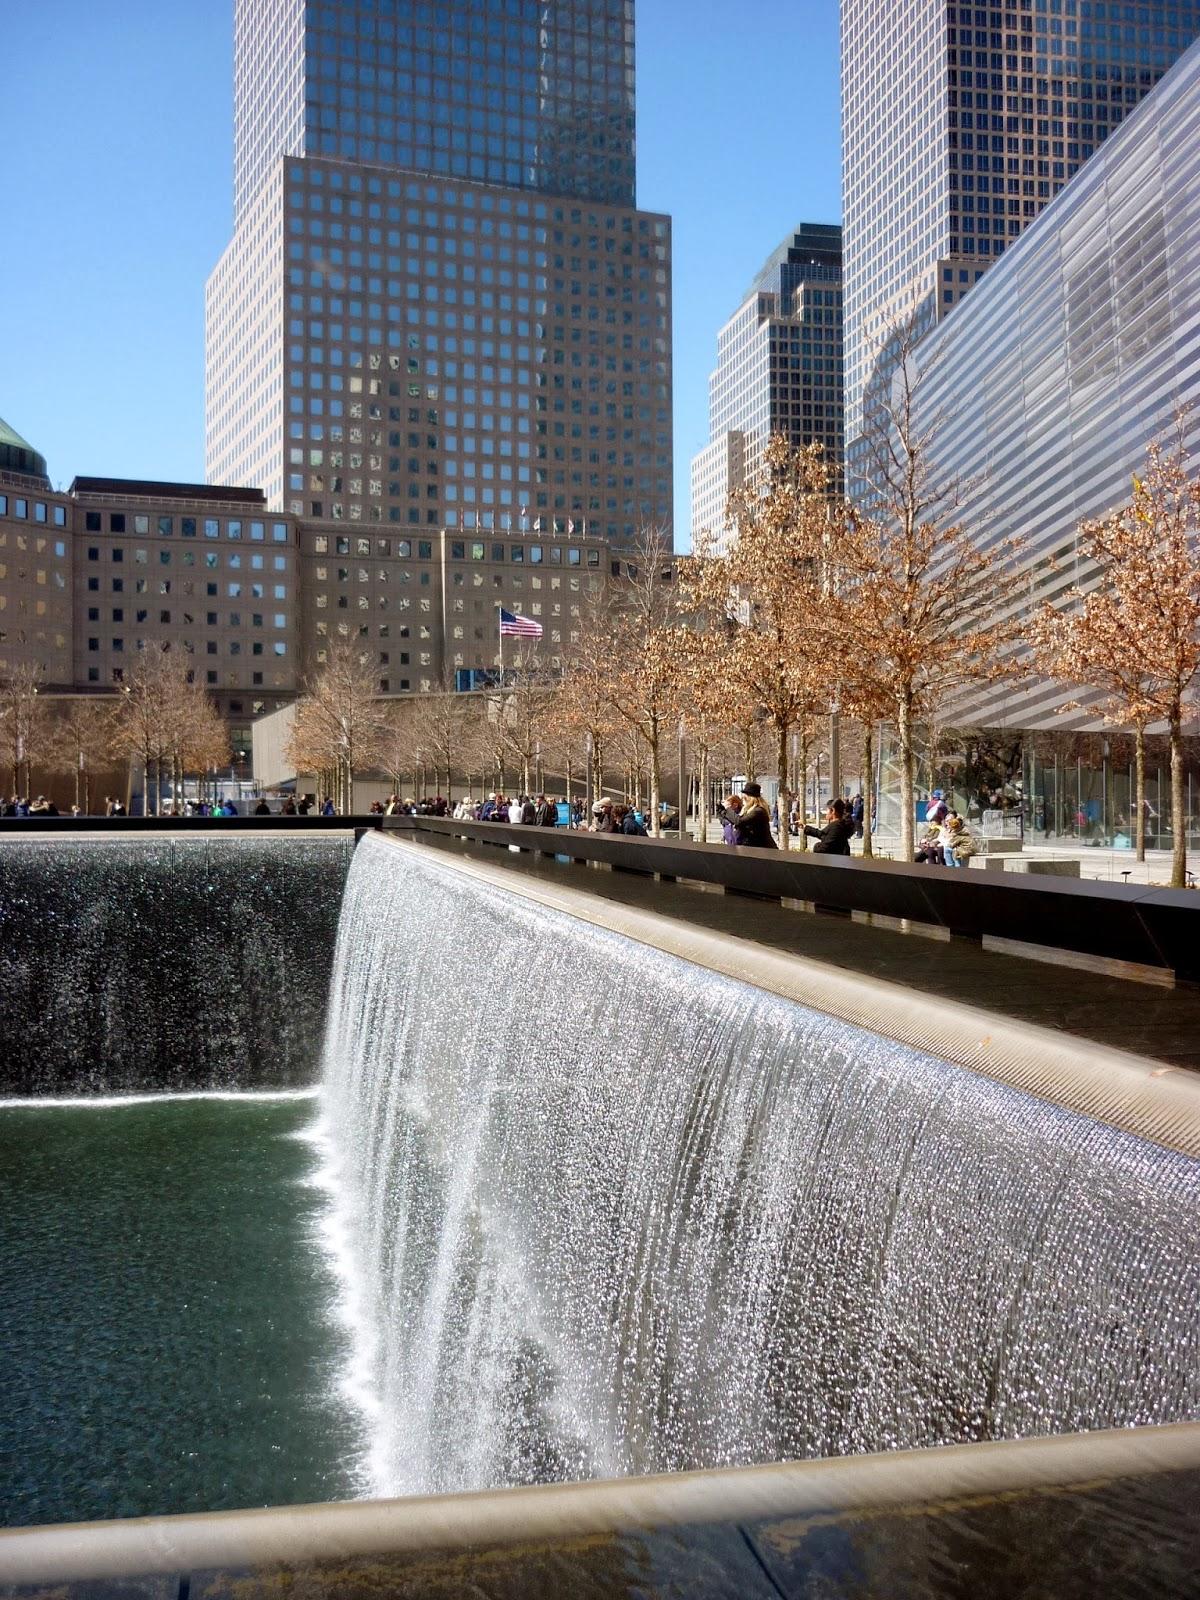 come prenotare la visita al memorial 9/11